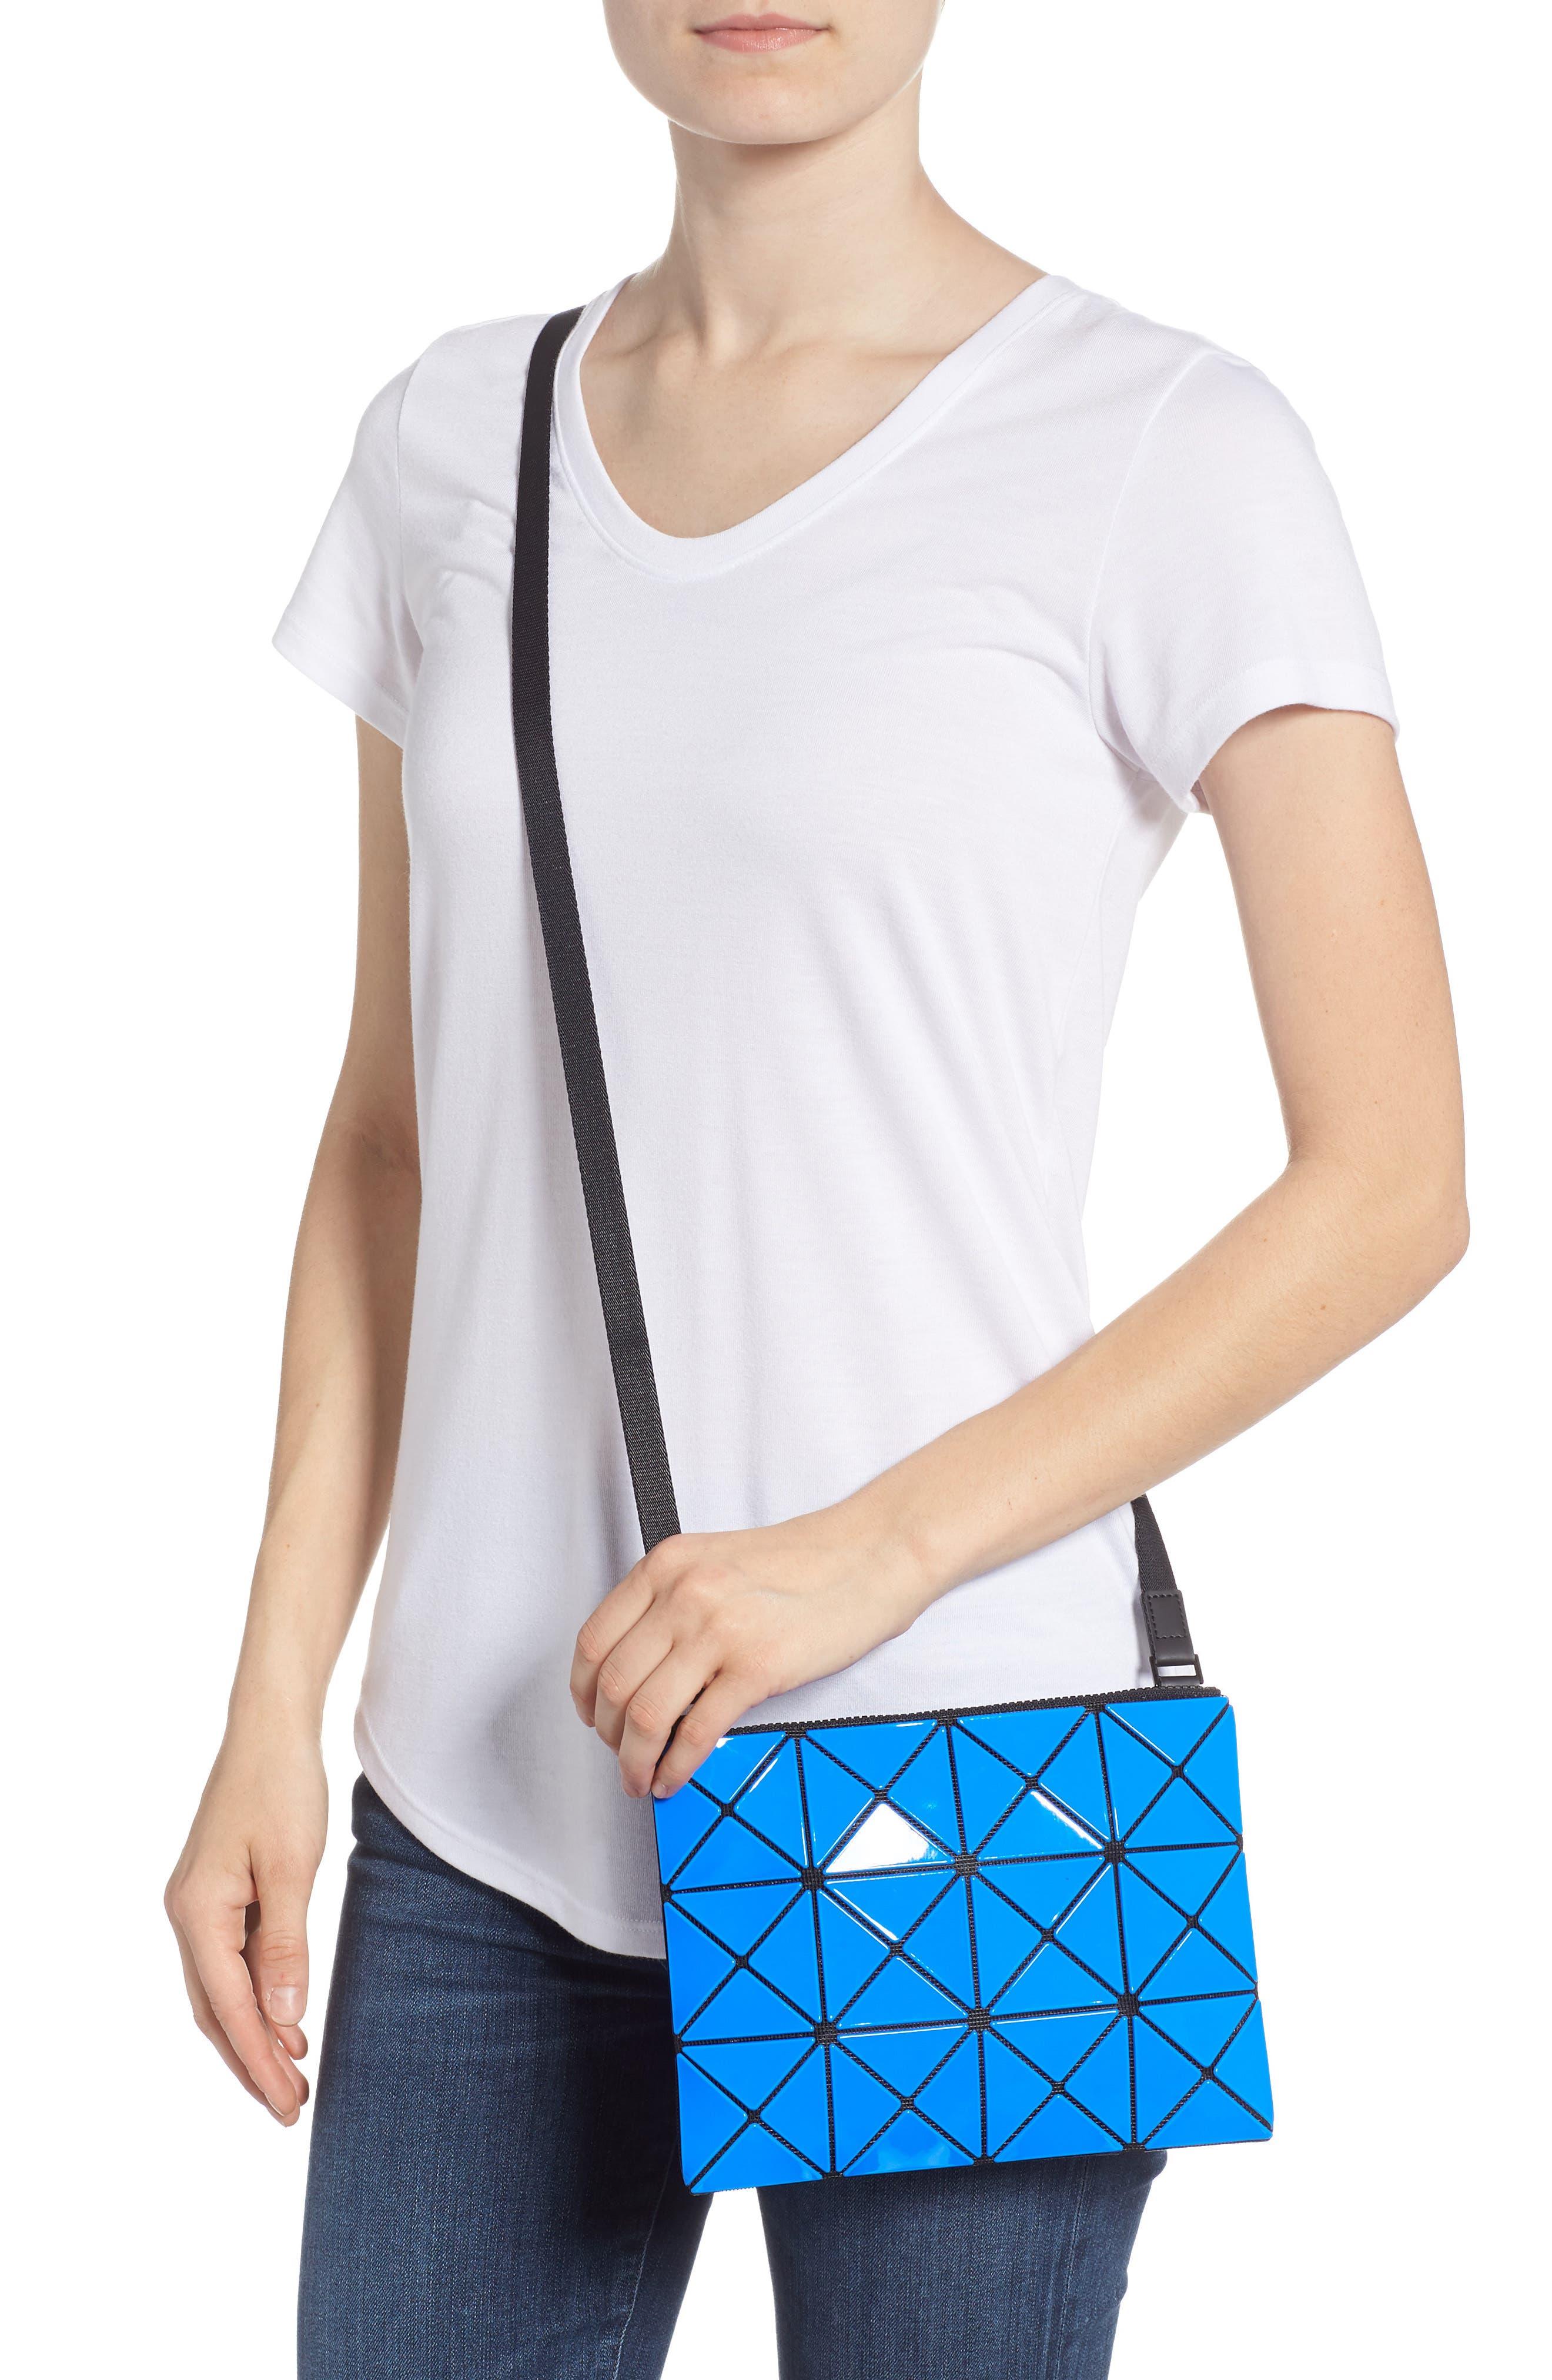 Lucent Two-Tone Crossbody Bag,                             Alternate thumbnail 2, color,                             BLUE/ DARK BLUE